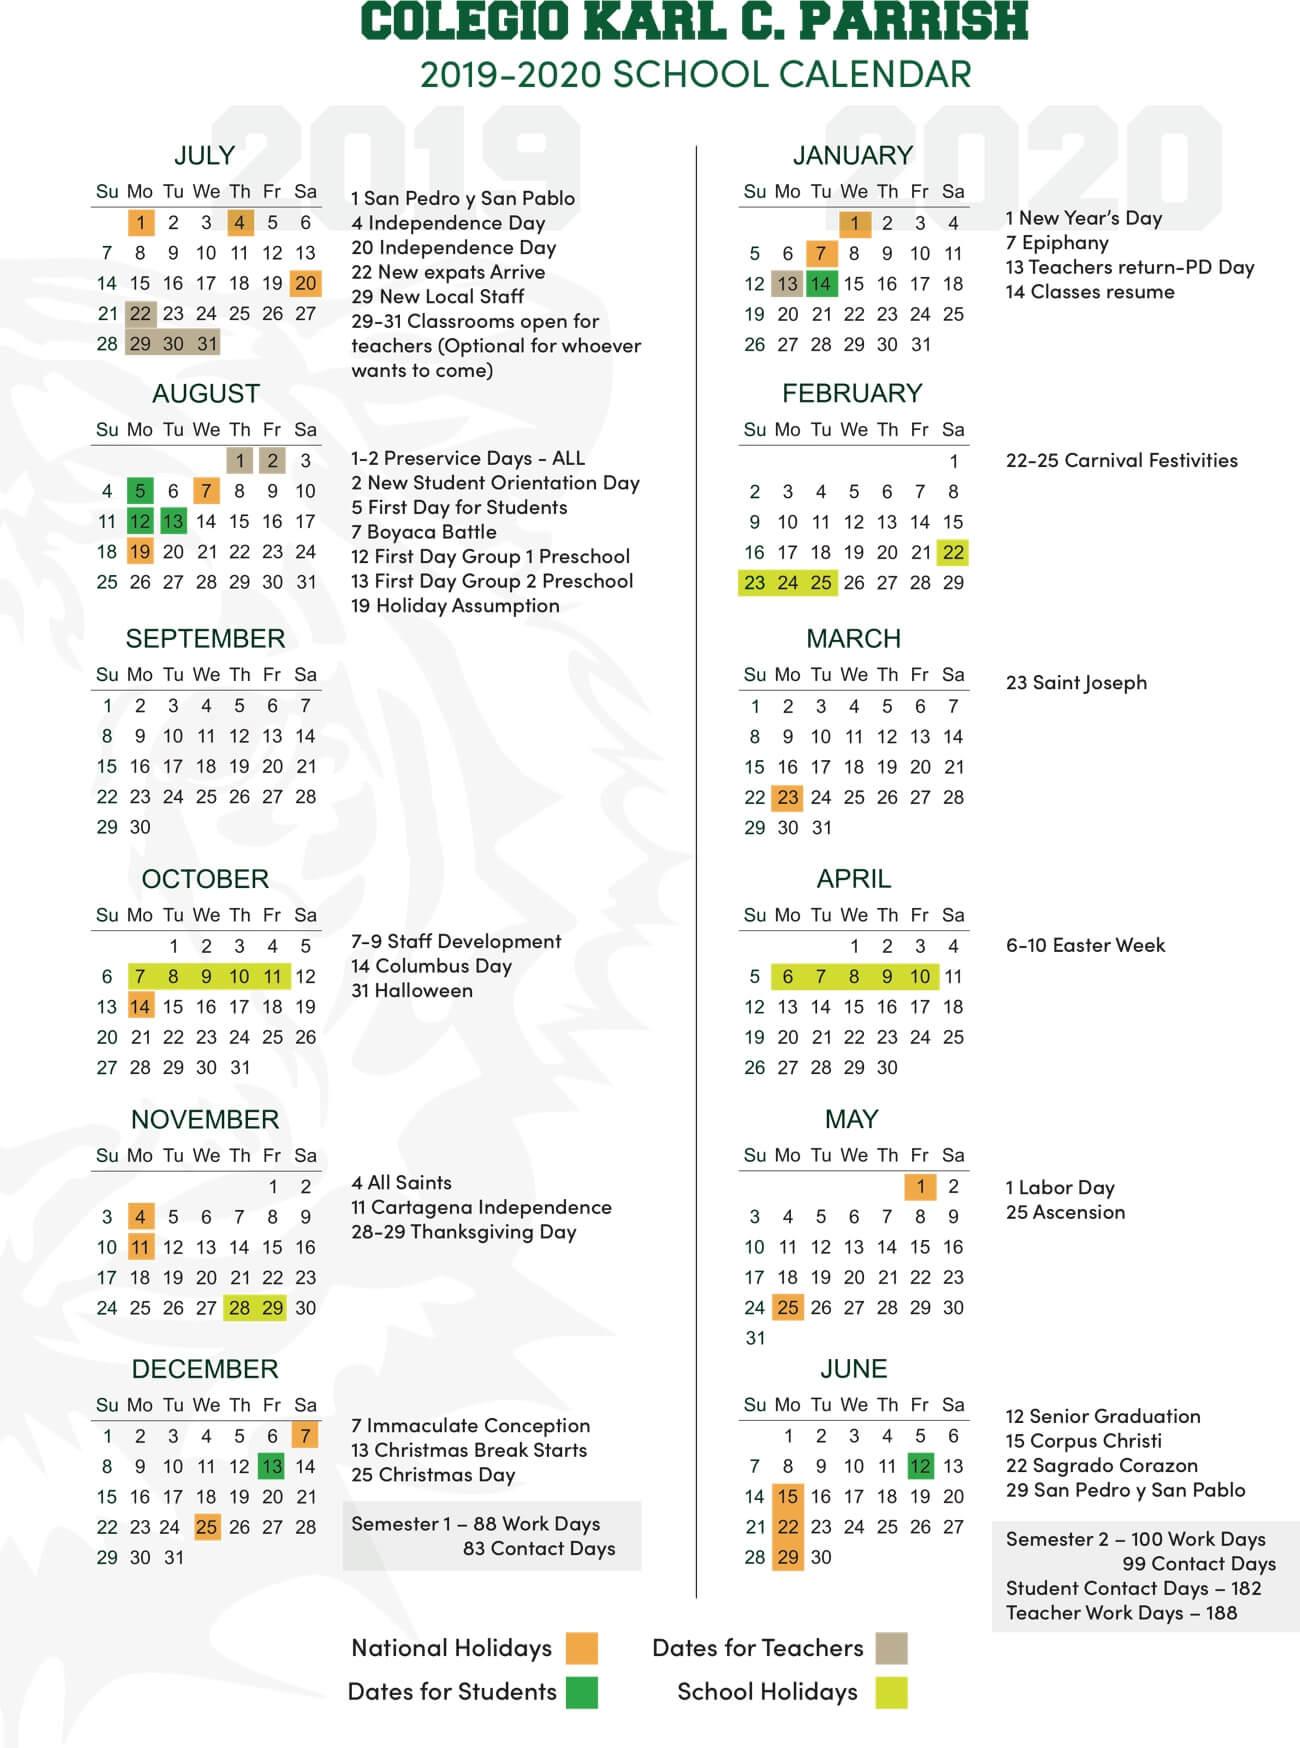 Calendario Mr Wonderful 2019 Para Imprimir.News Archives Page 2 Of 8 Sociedad Escuela Karl C Parrish